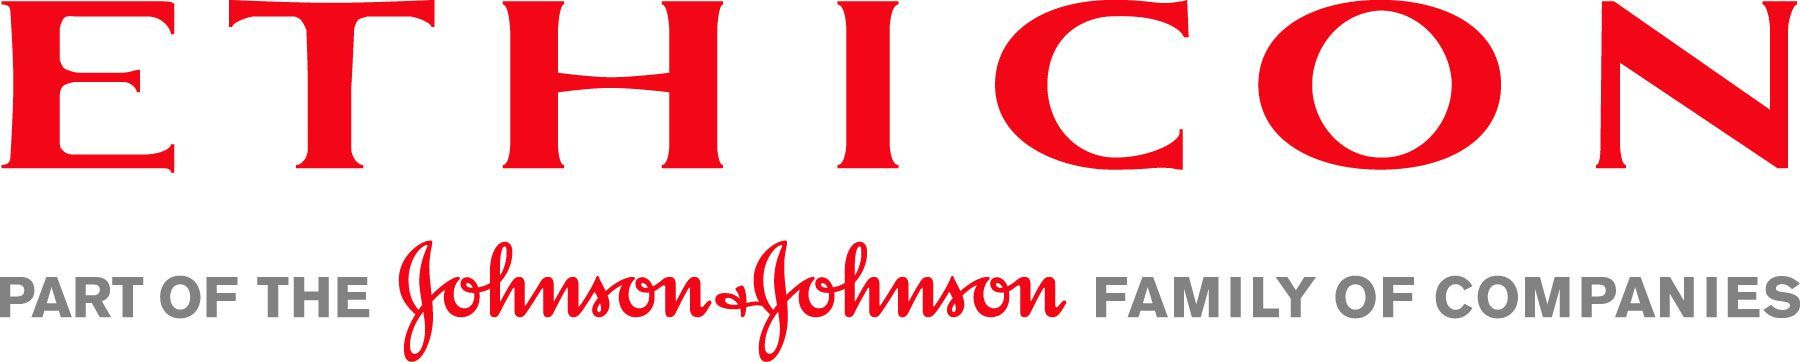 Ethicon - Johnson & Johnson